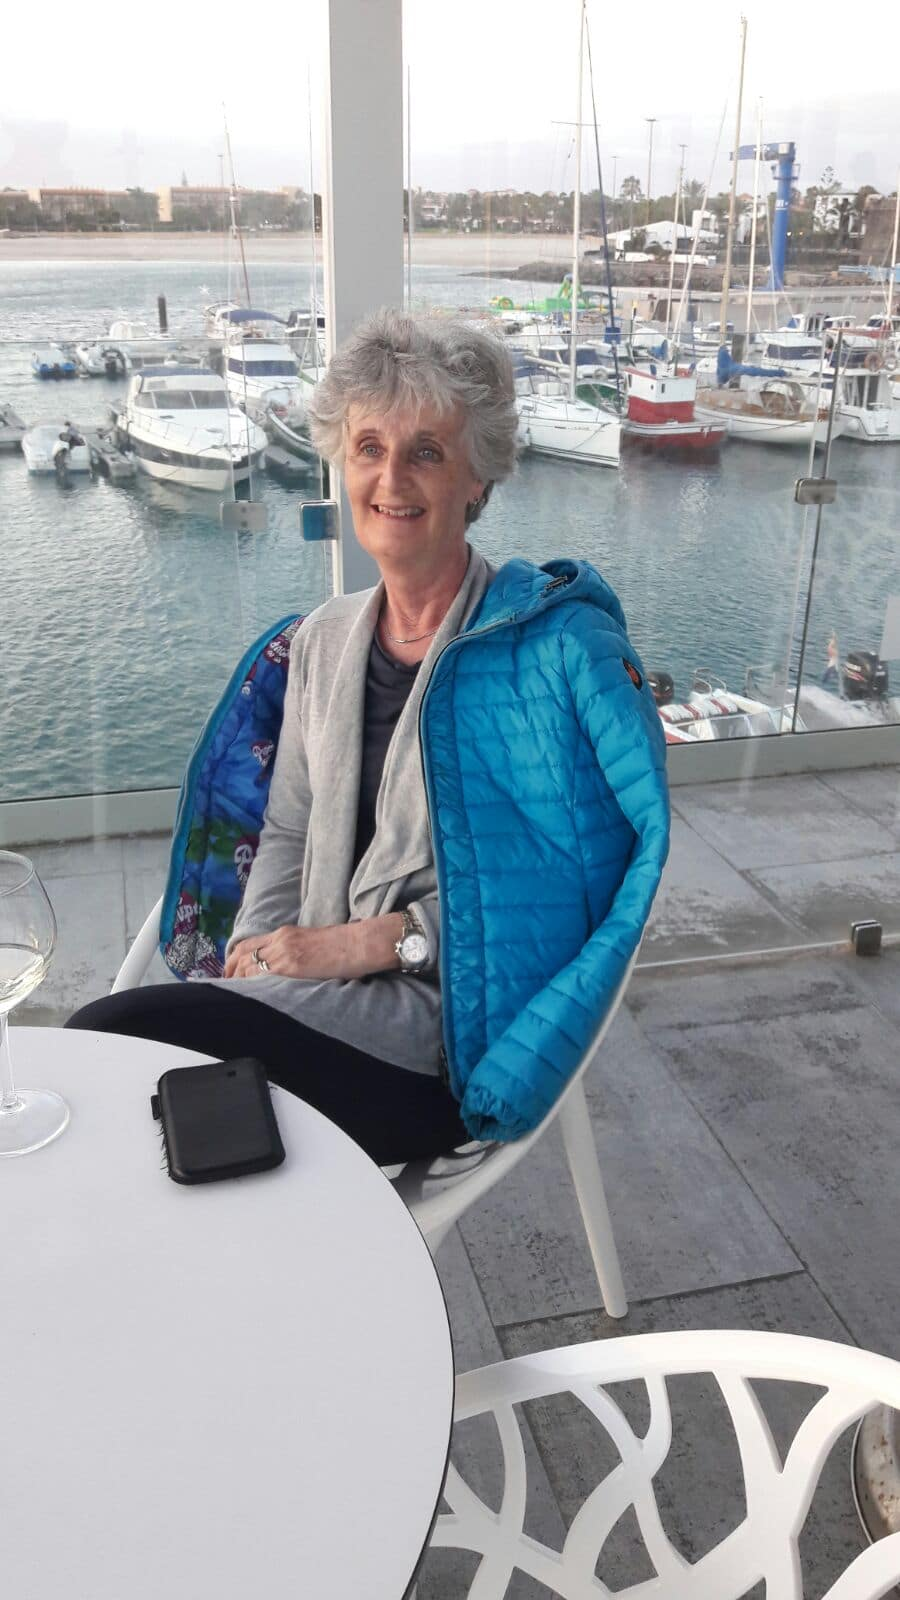 Josée Kolijn-de Man, Diagnosed 2015 - ALS Patients Connected, The Netherlands